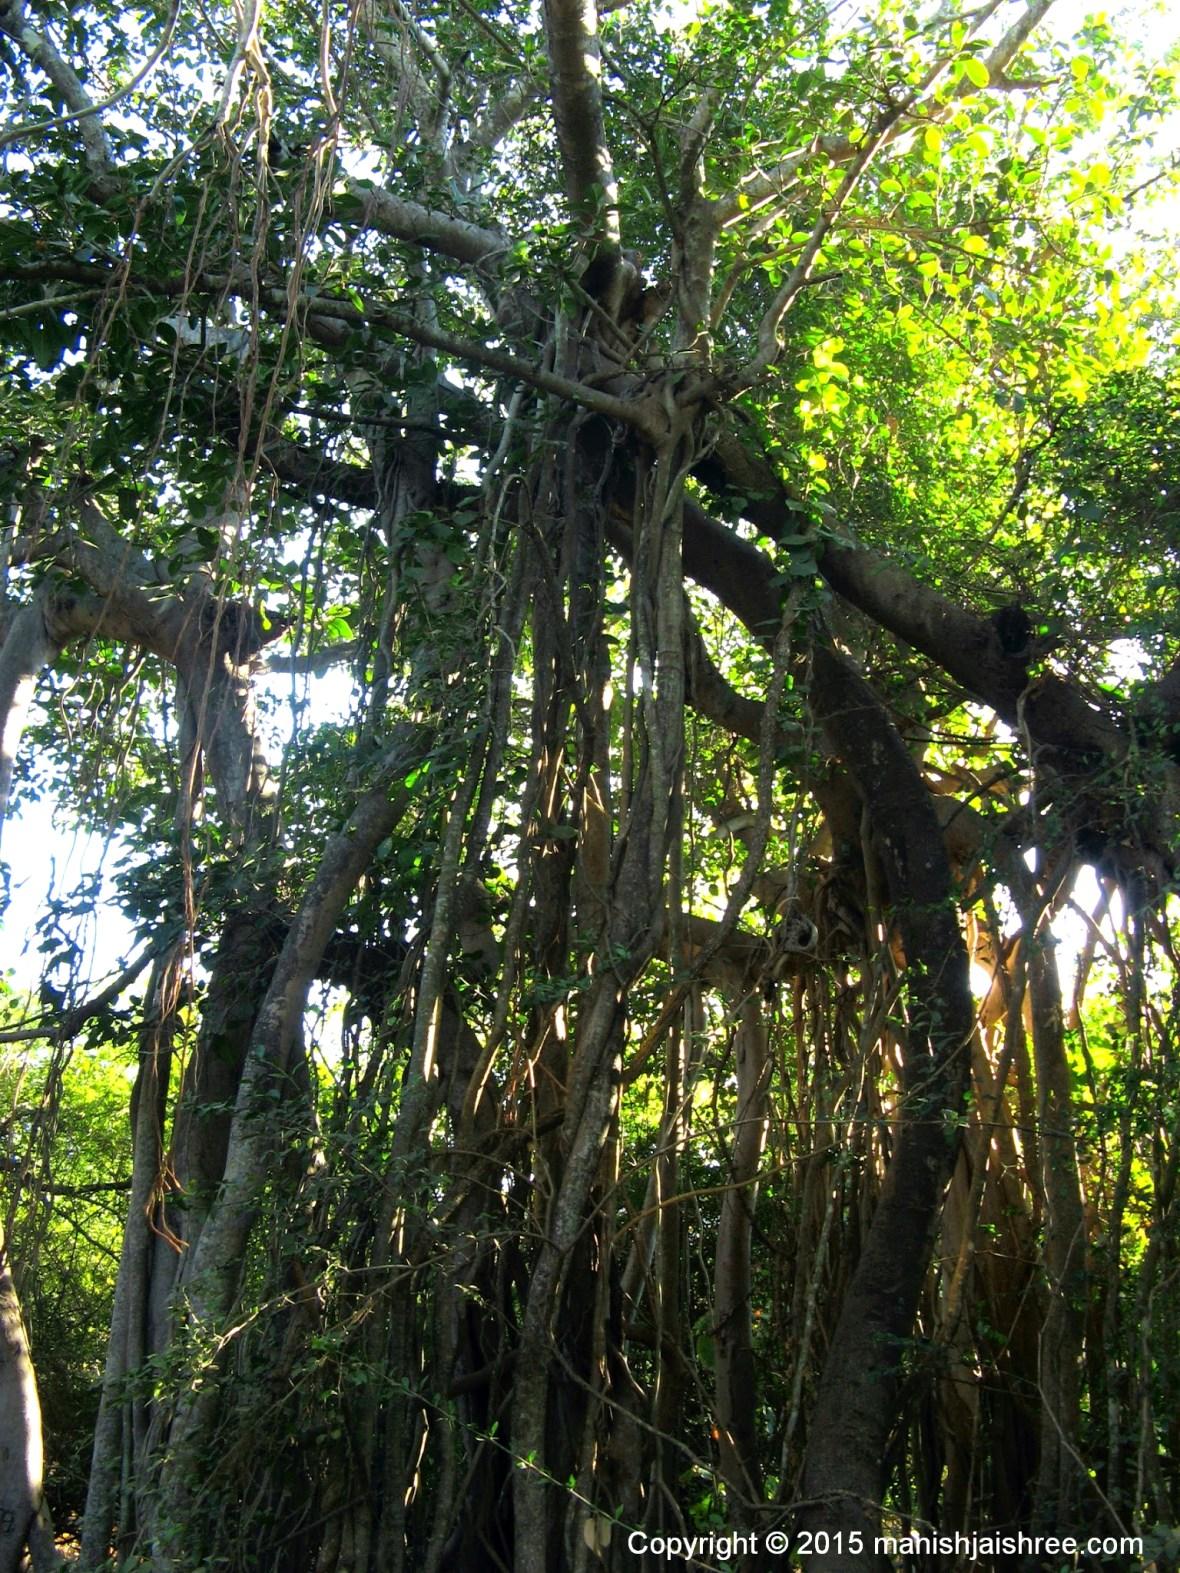 Banyan Tree, Sasan-Gir